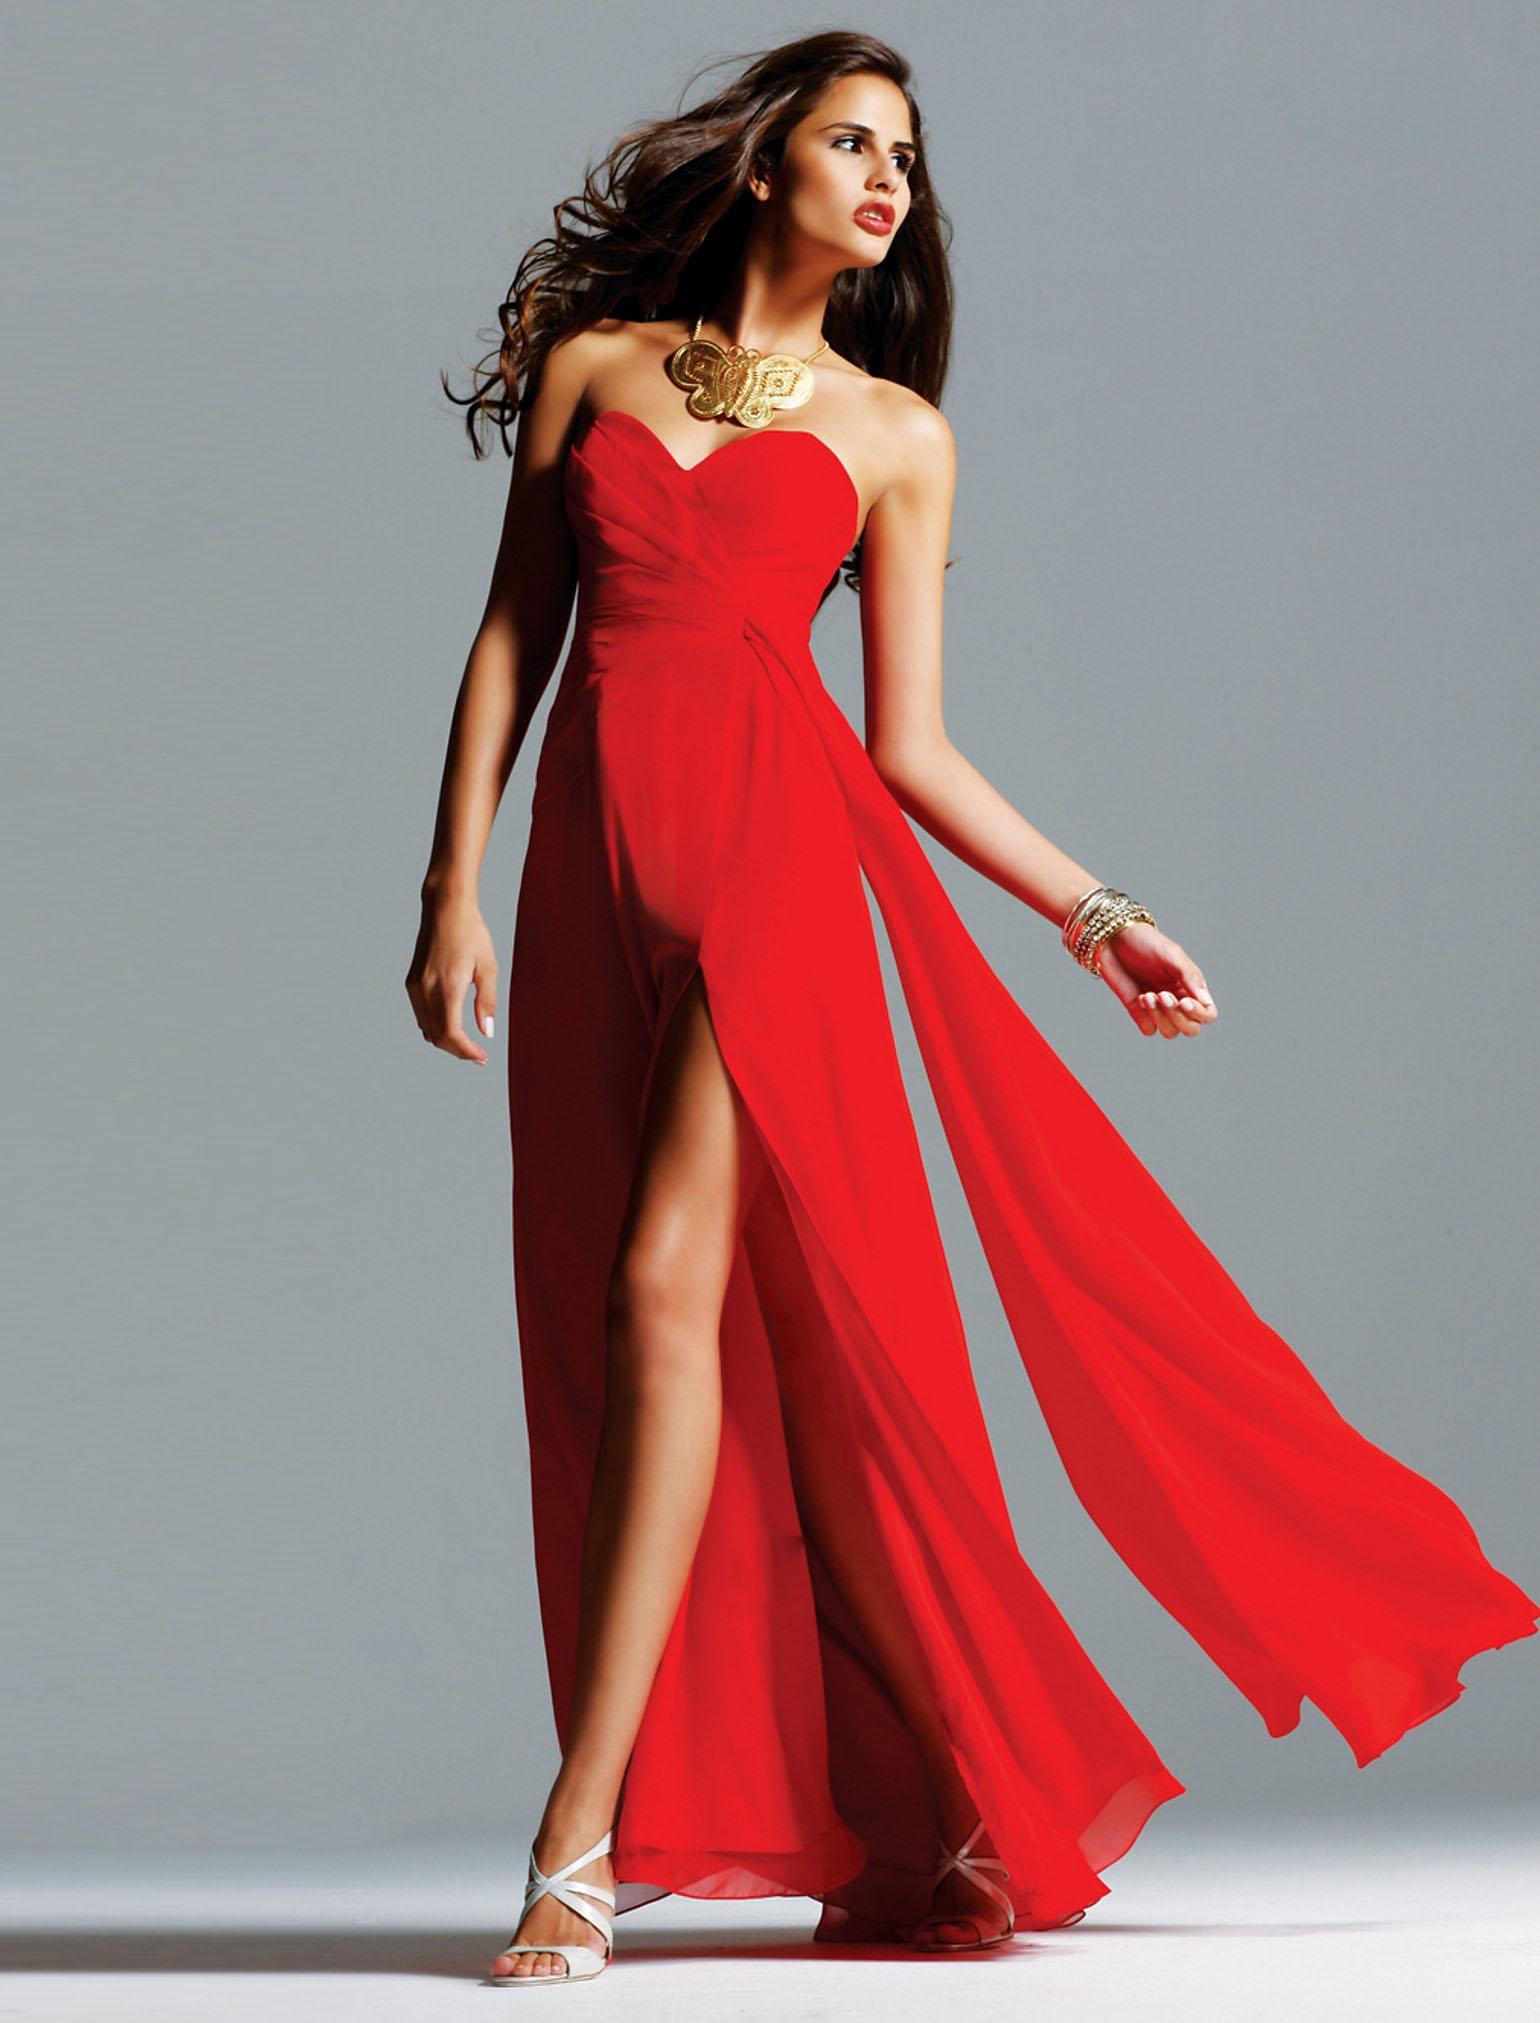 Vetement Grossesse Pas Cher Fashion